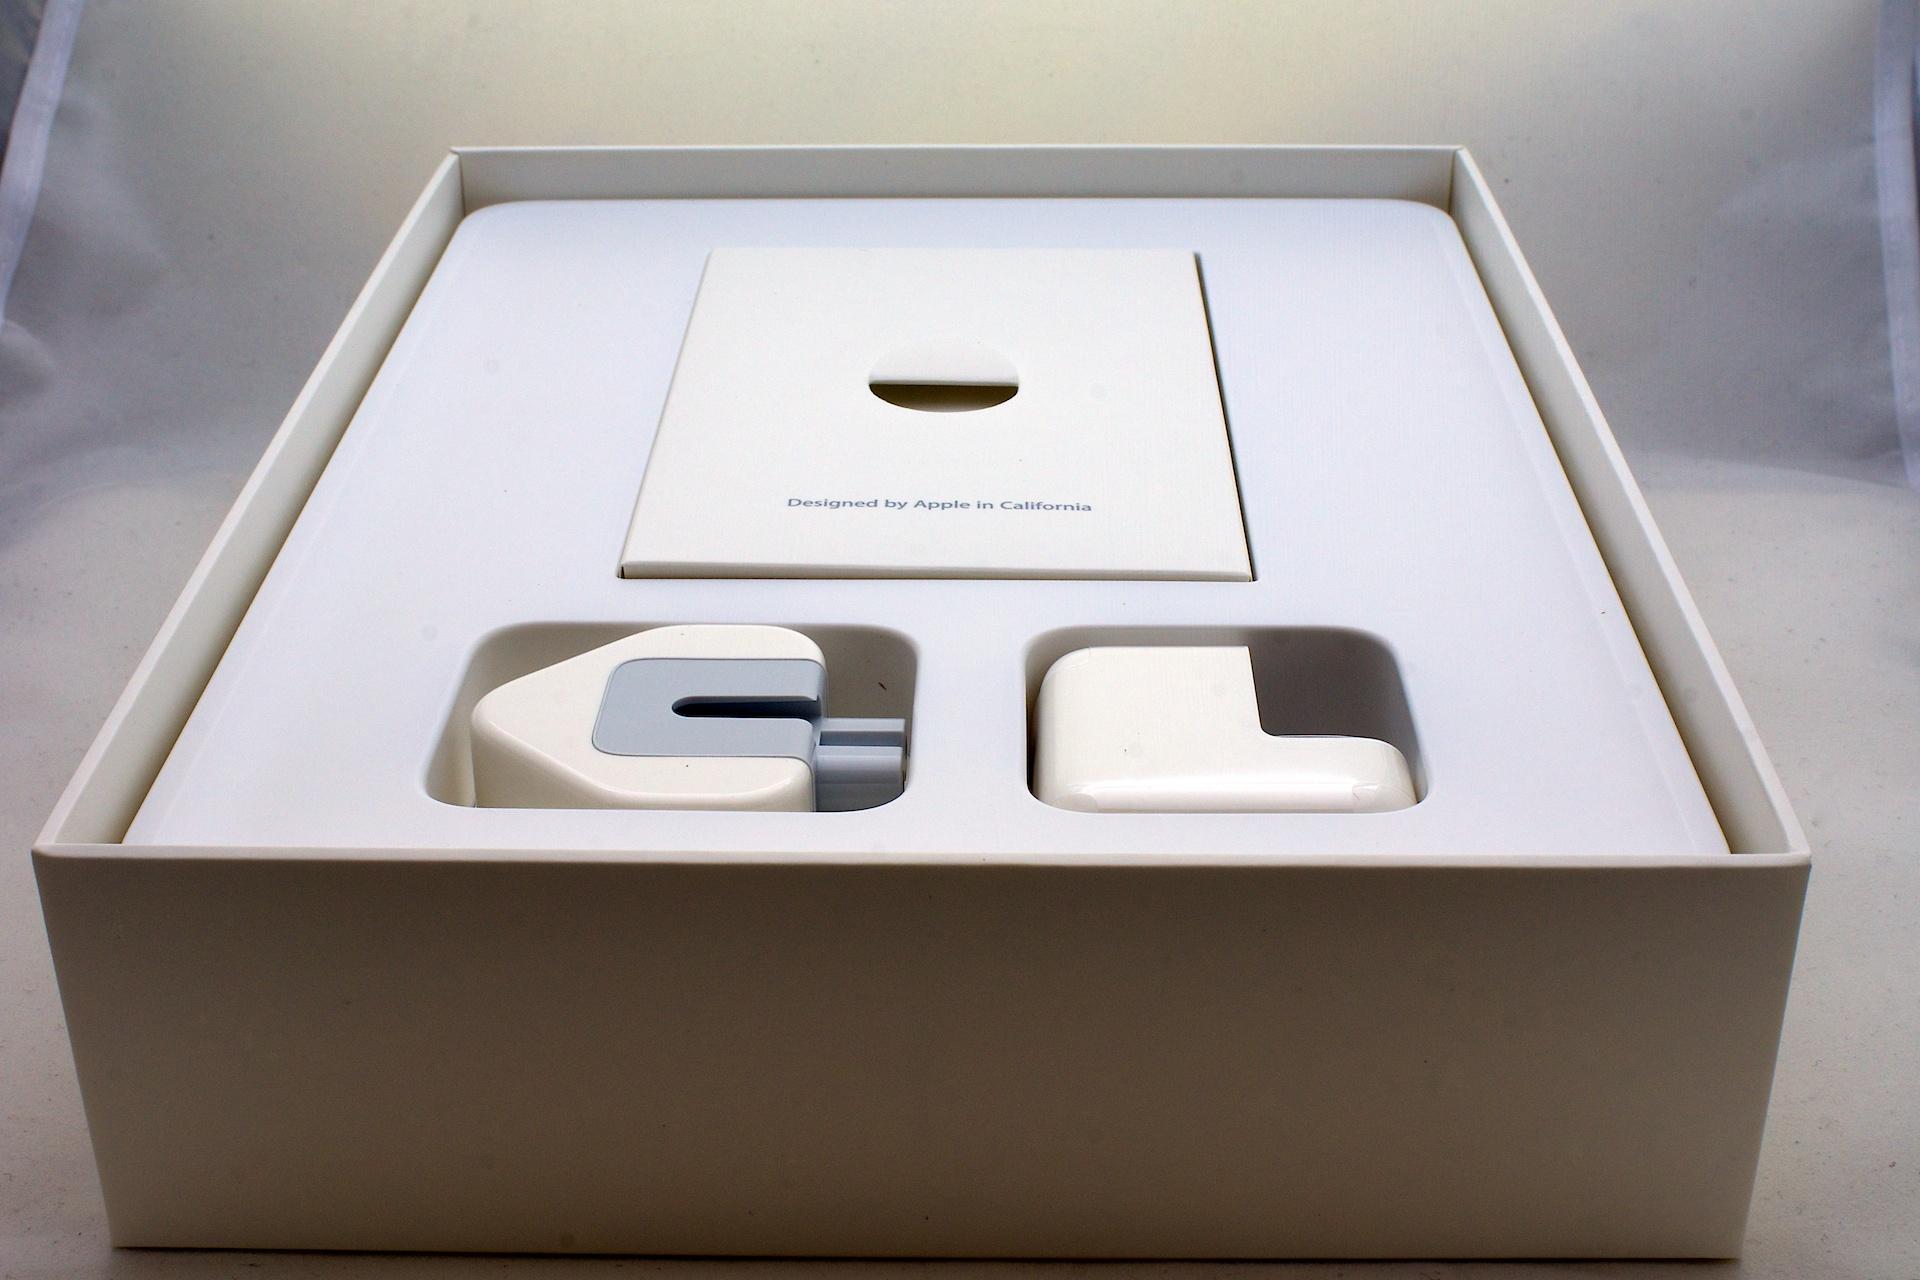 Apple Ipad 3 Box File:ipad 3 Box Contents.jpg